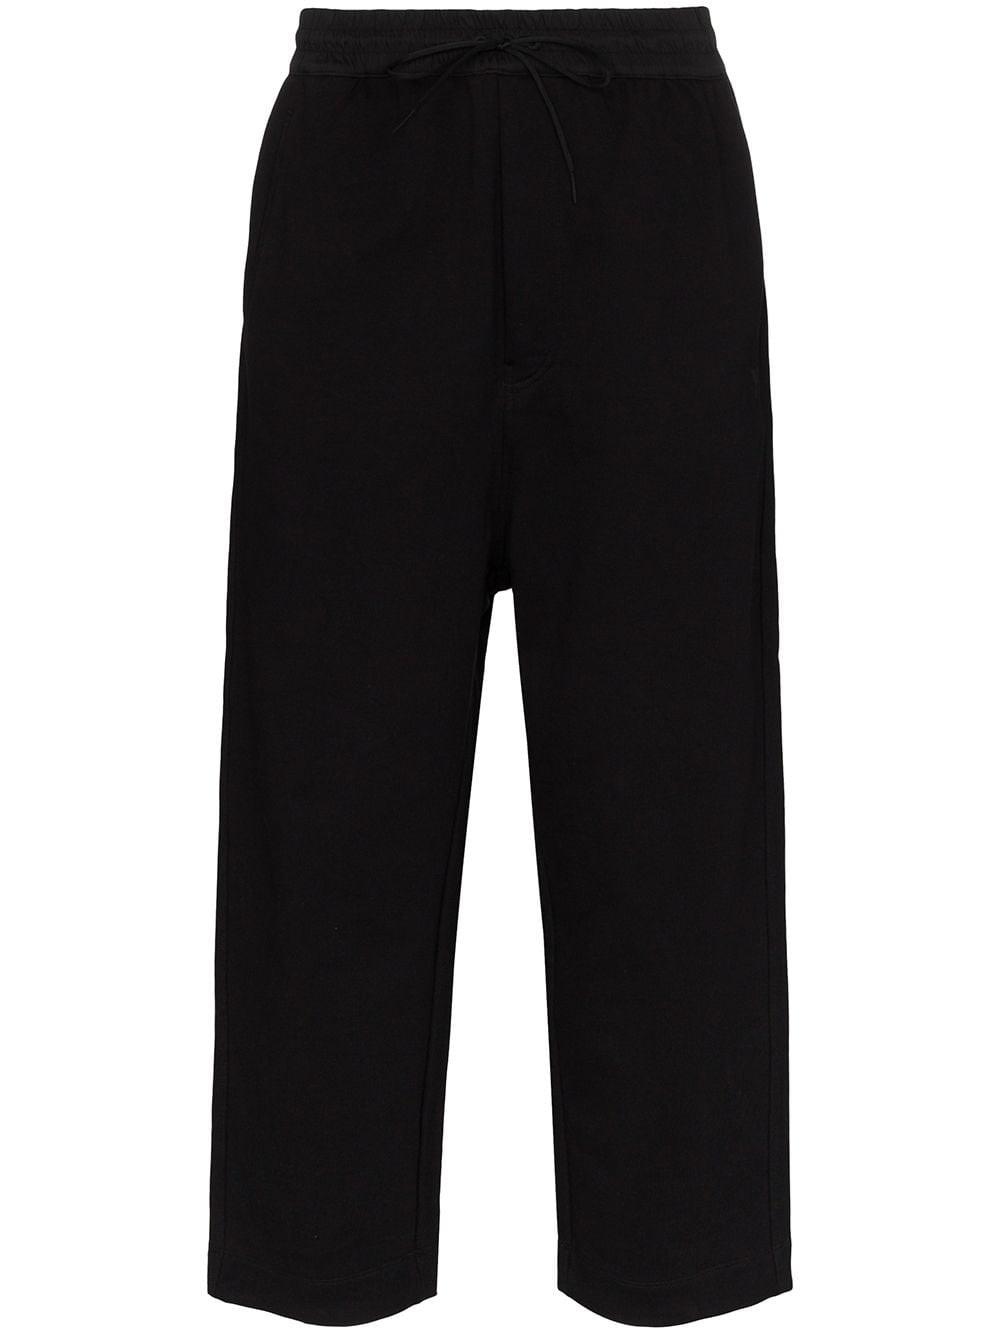 ADIDAS Y-3 Cropped Sweatpants